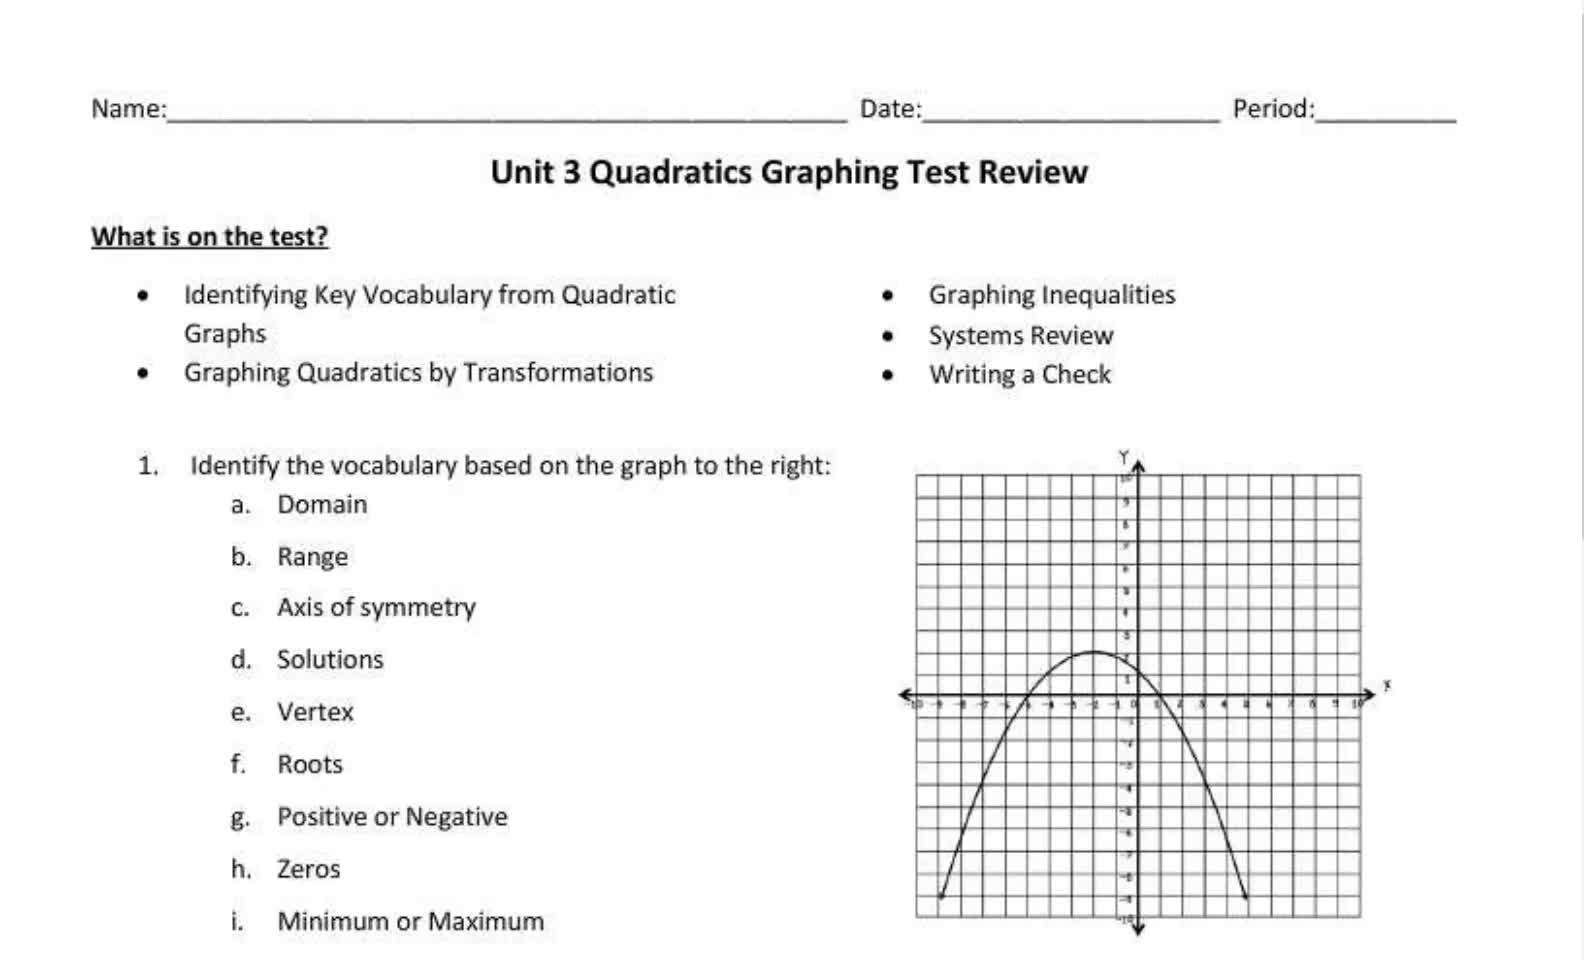 Senior Quadratics Graphing Test Review